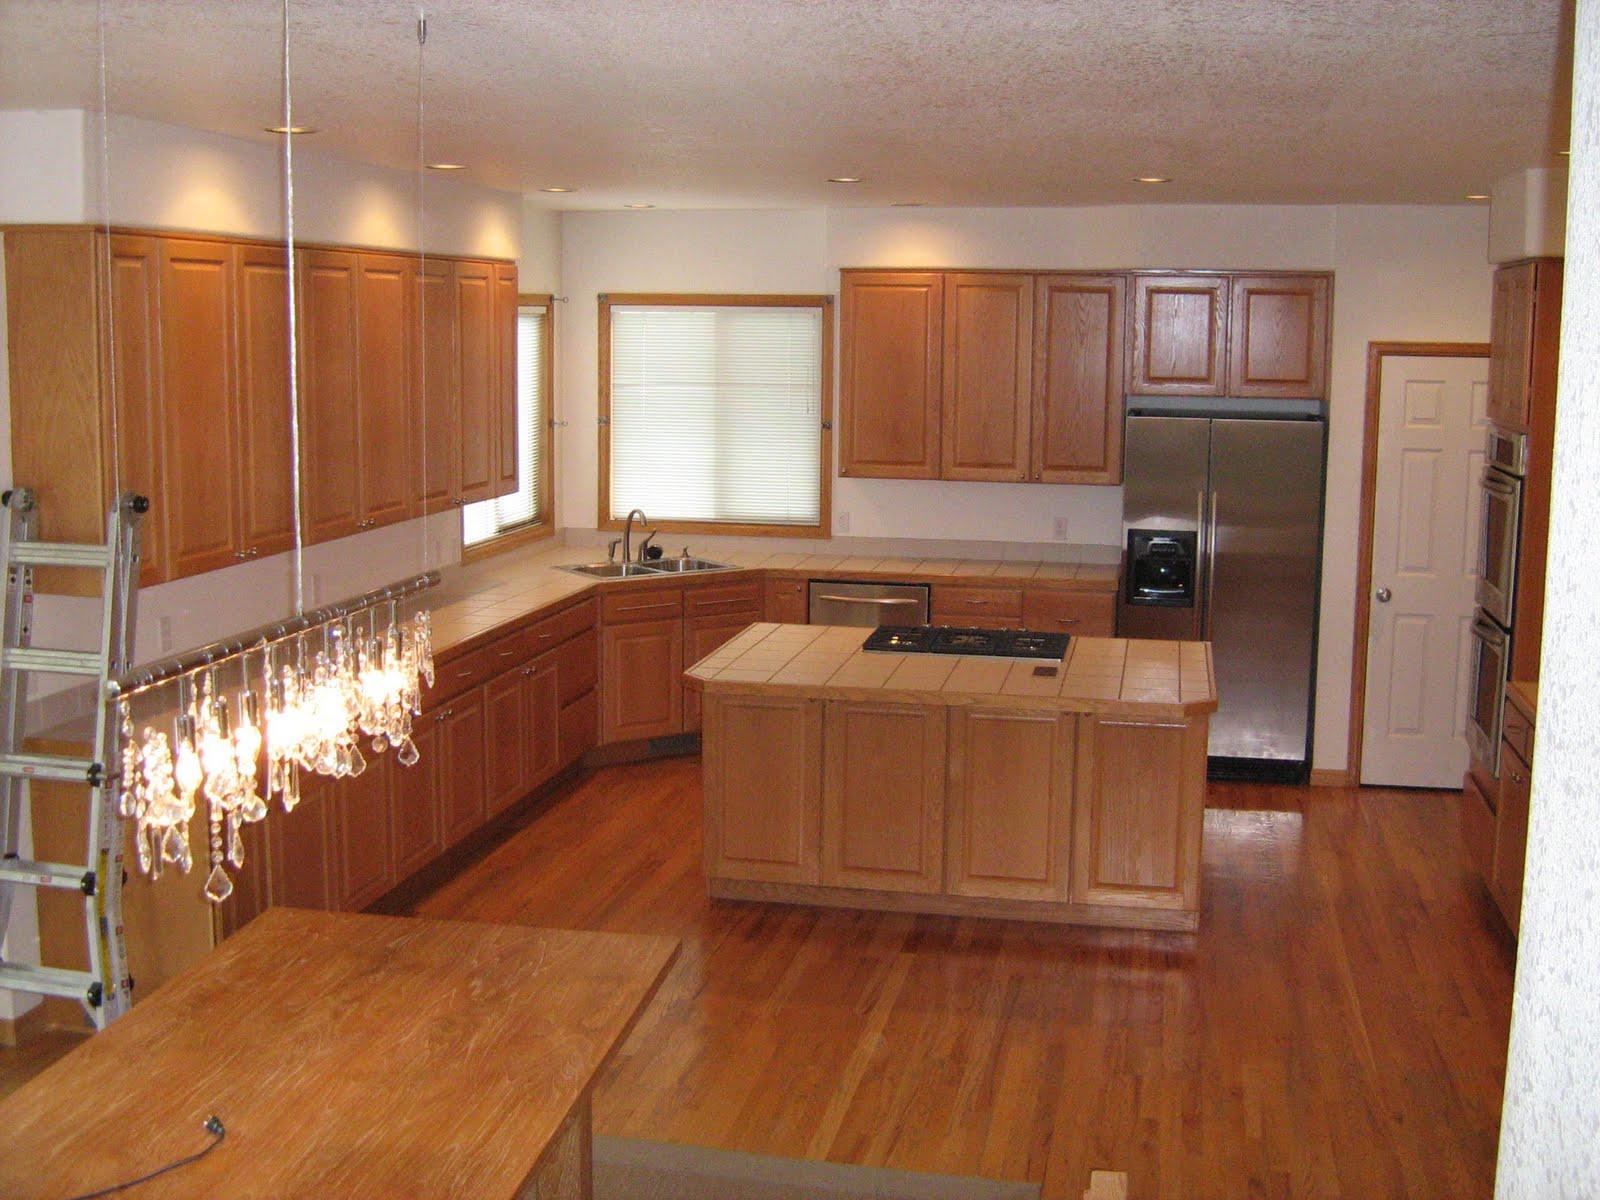 Best ideas about Kitchen Paint Colors With Oak Cabinets . Save or Pin Kitchen Paint Colors With Oak Cabinets Ideas Now.